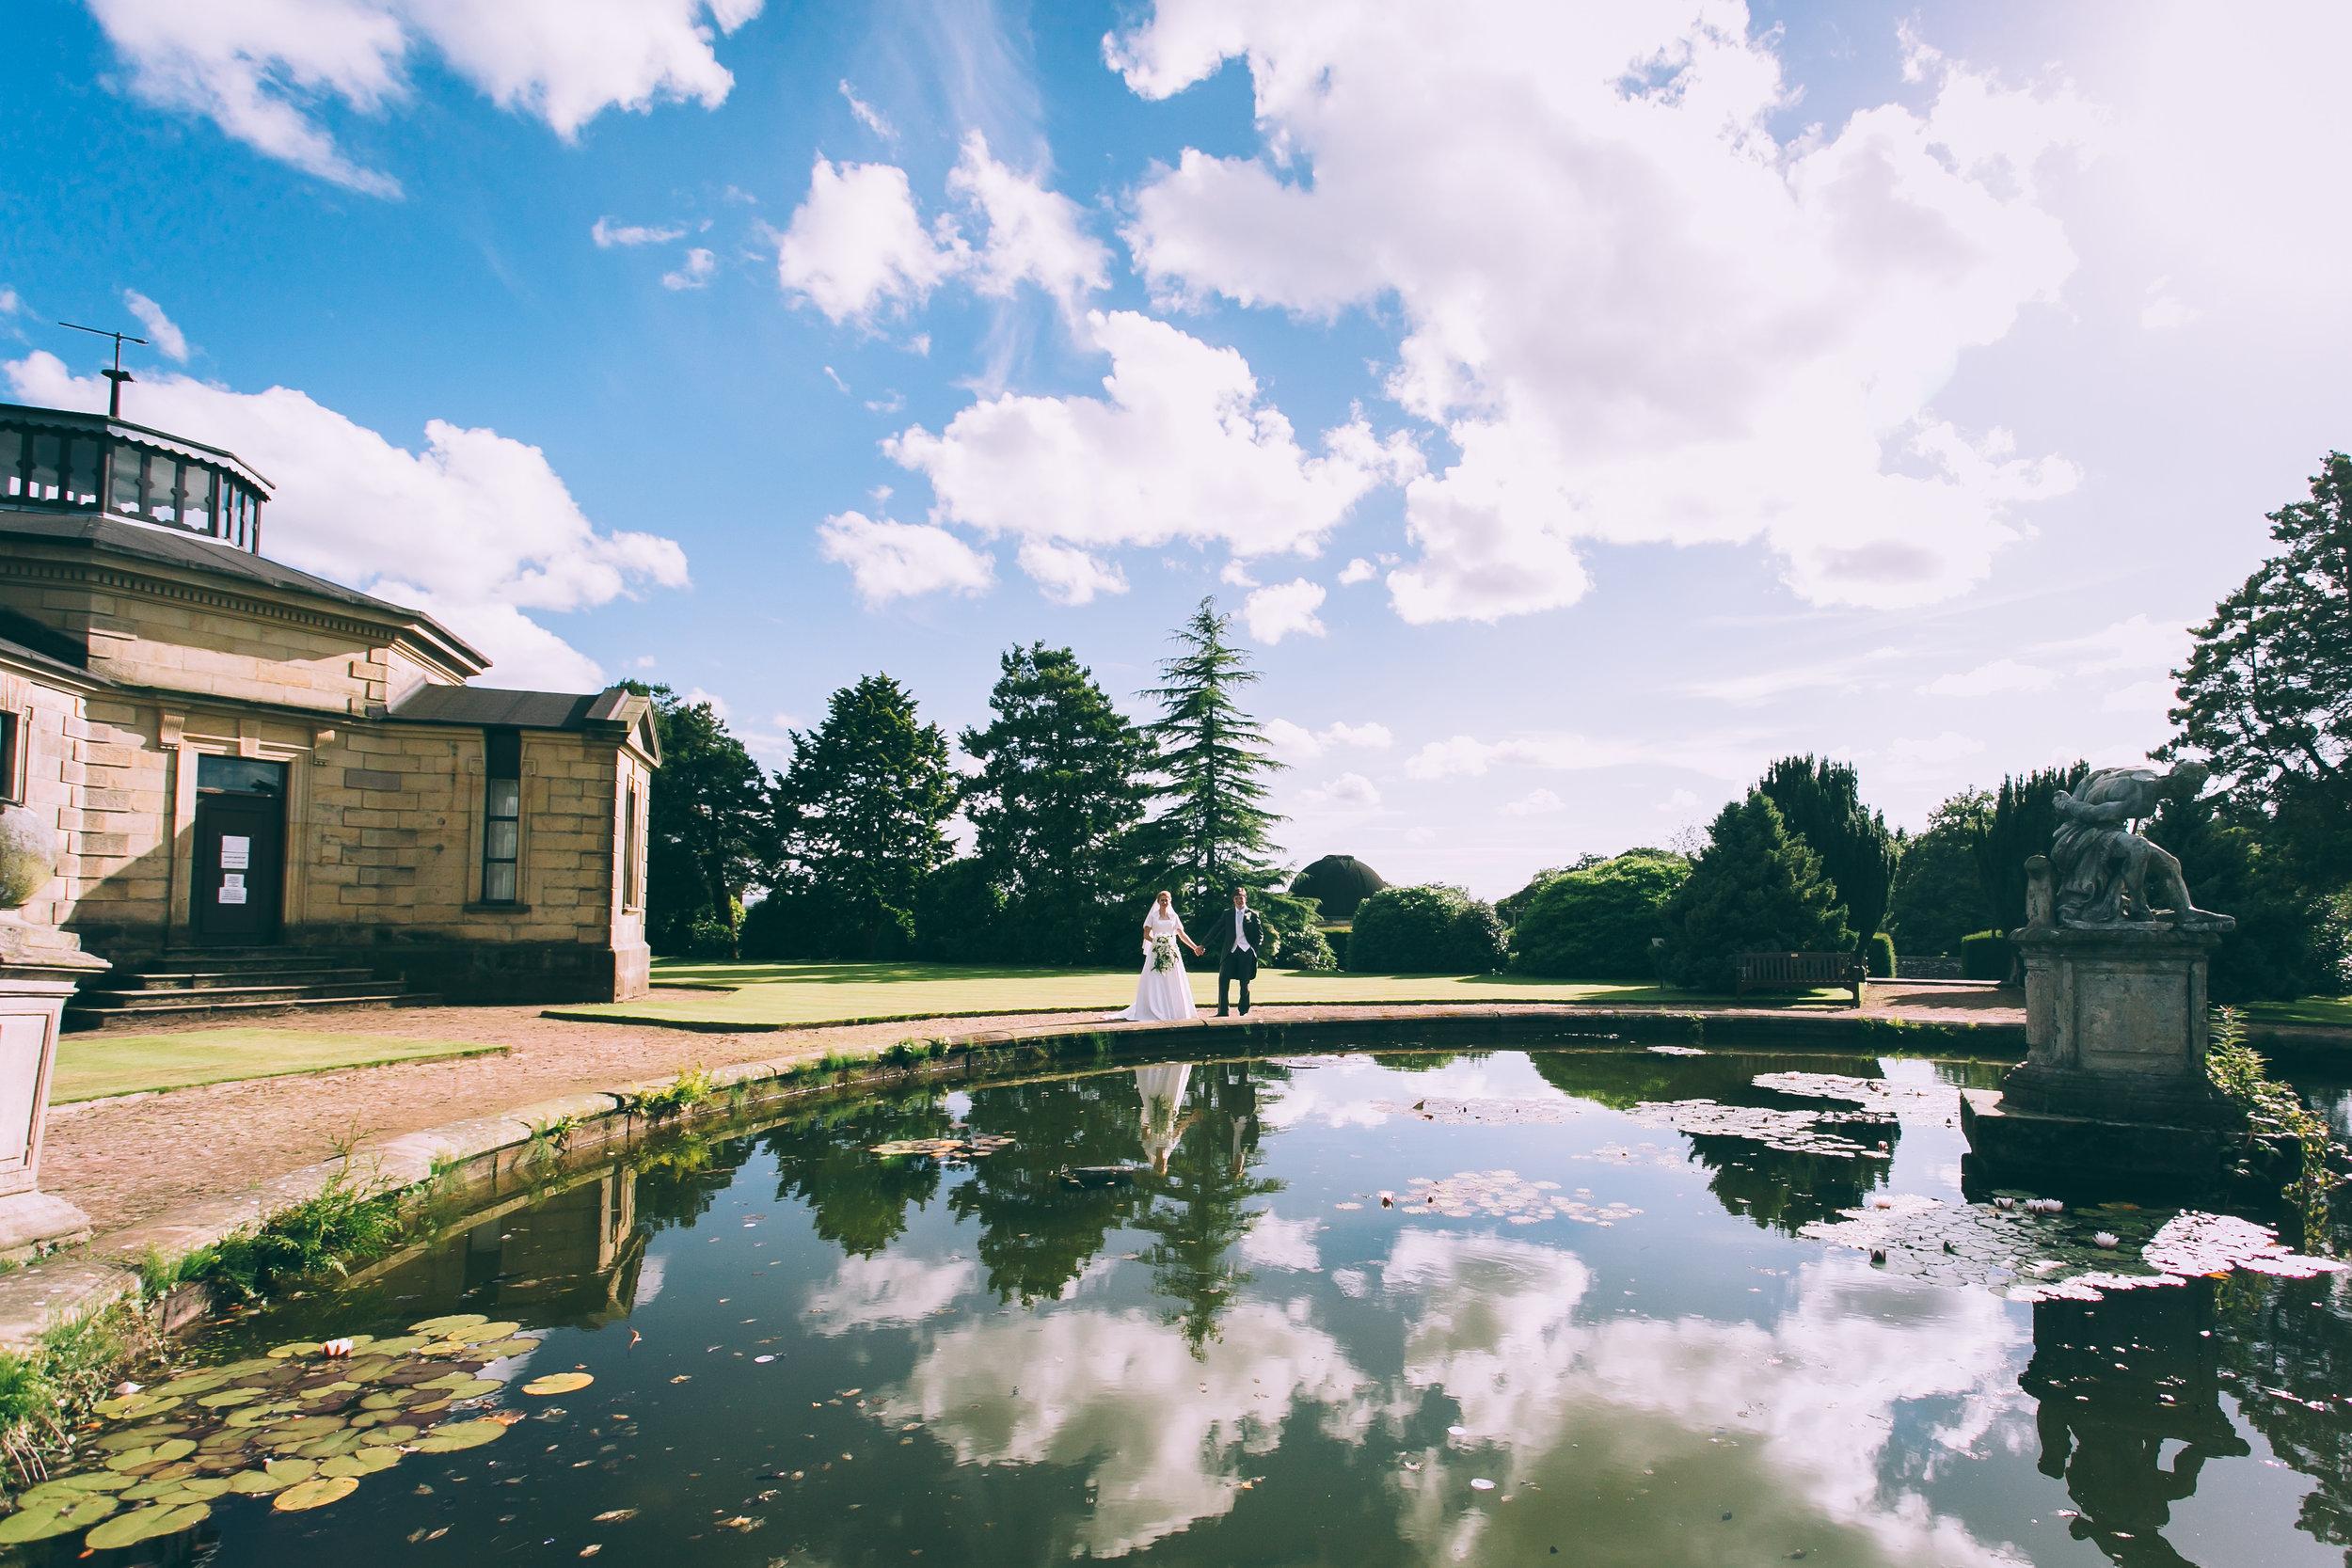 Lucia&Greg-Wedding-at-Stonyhurst-college-tom-biddle-tb272.jpg